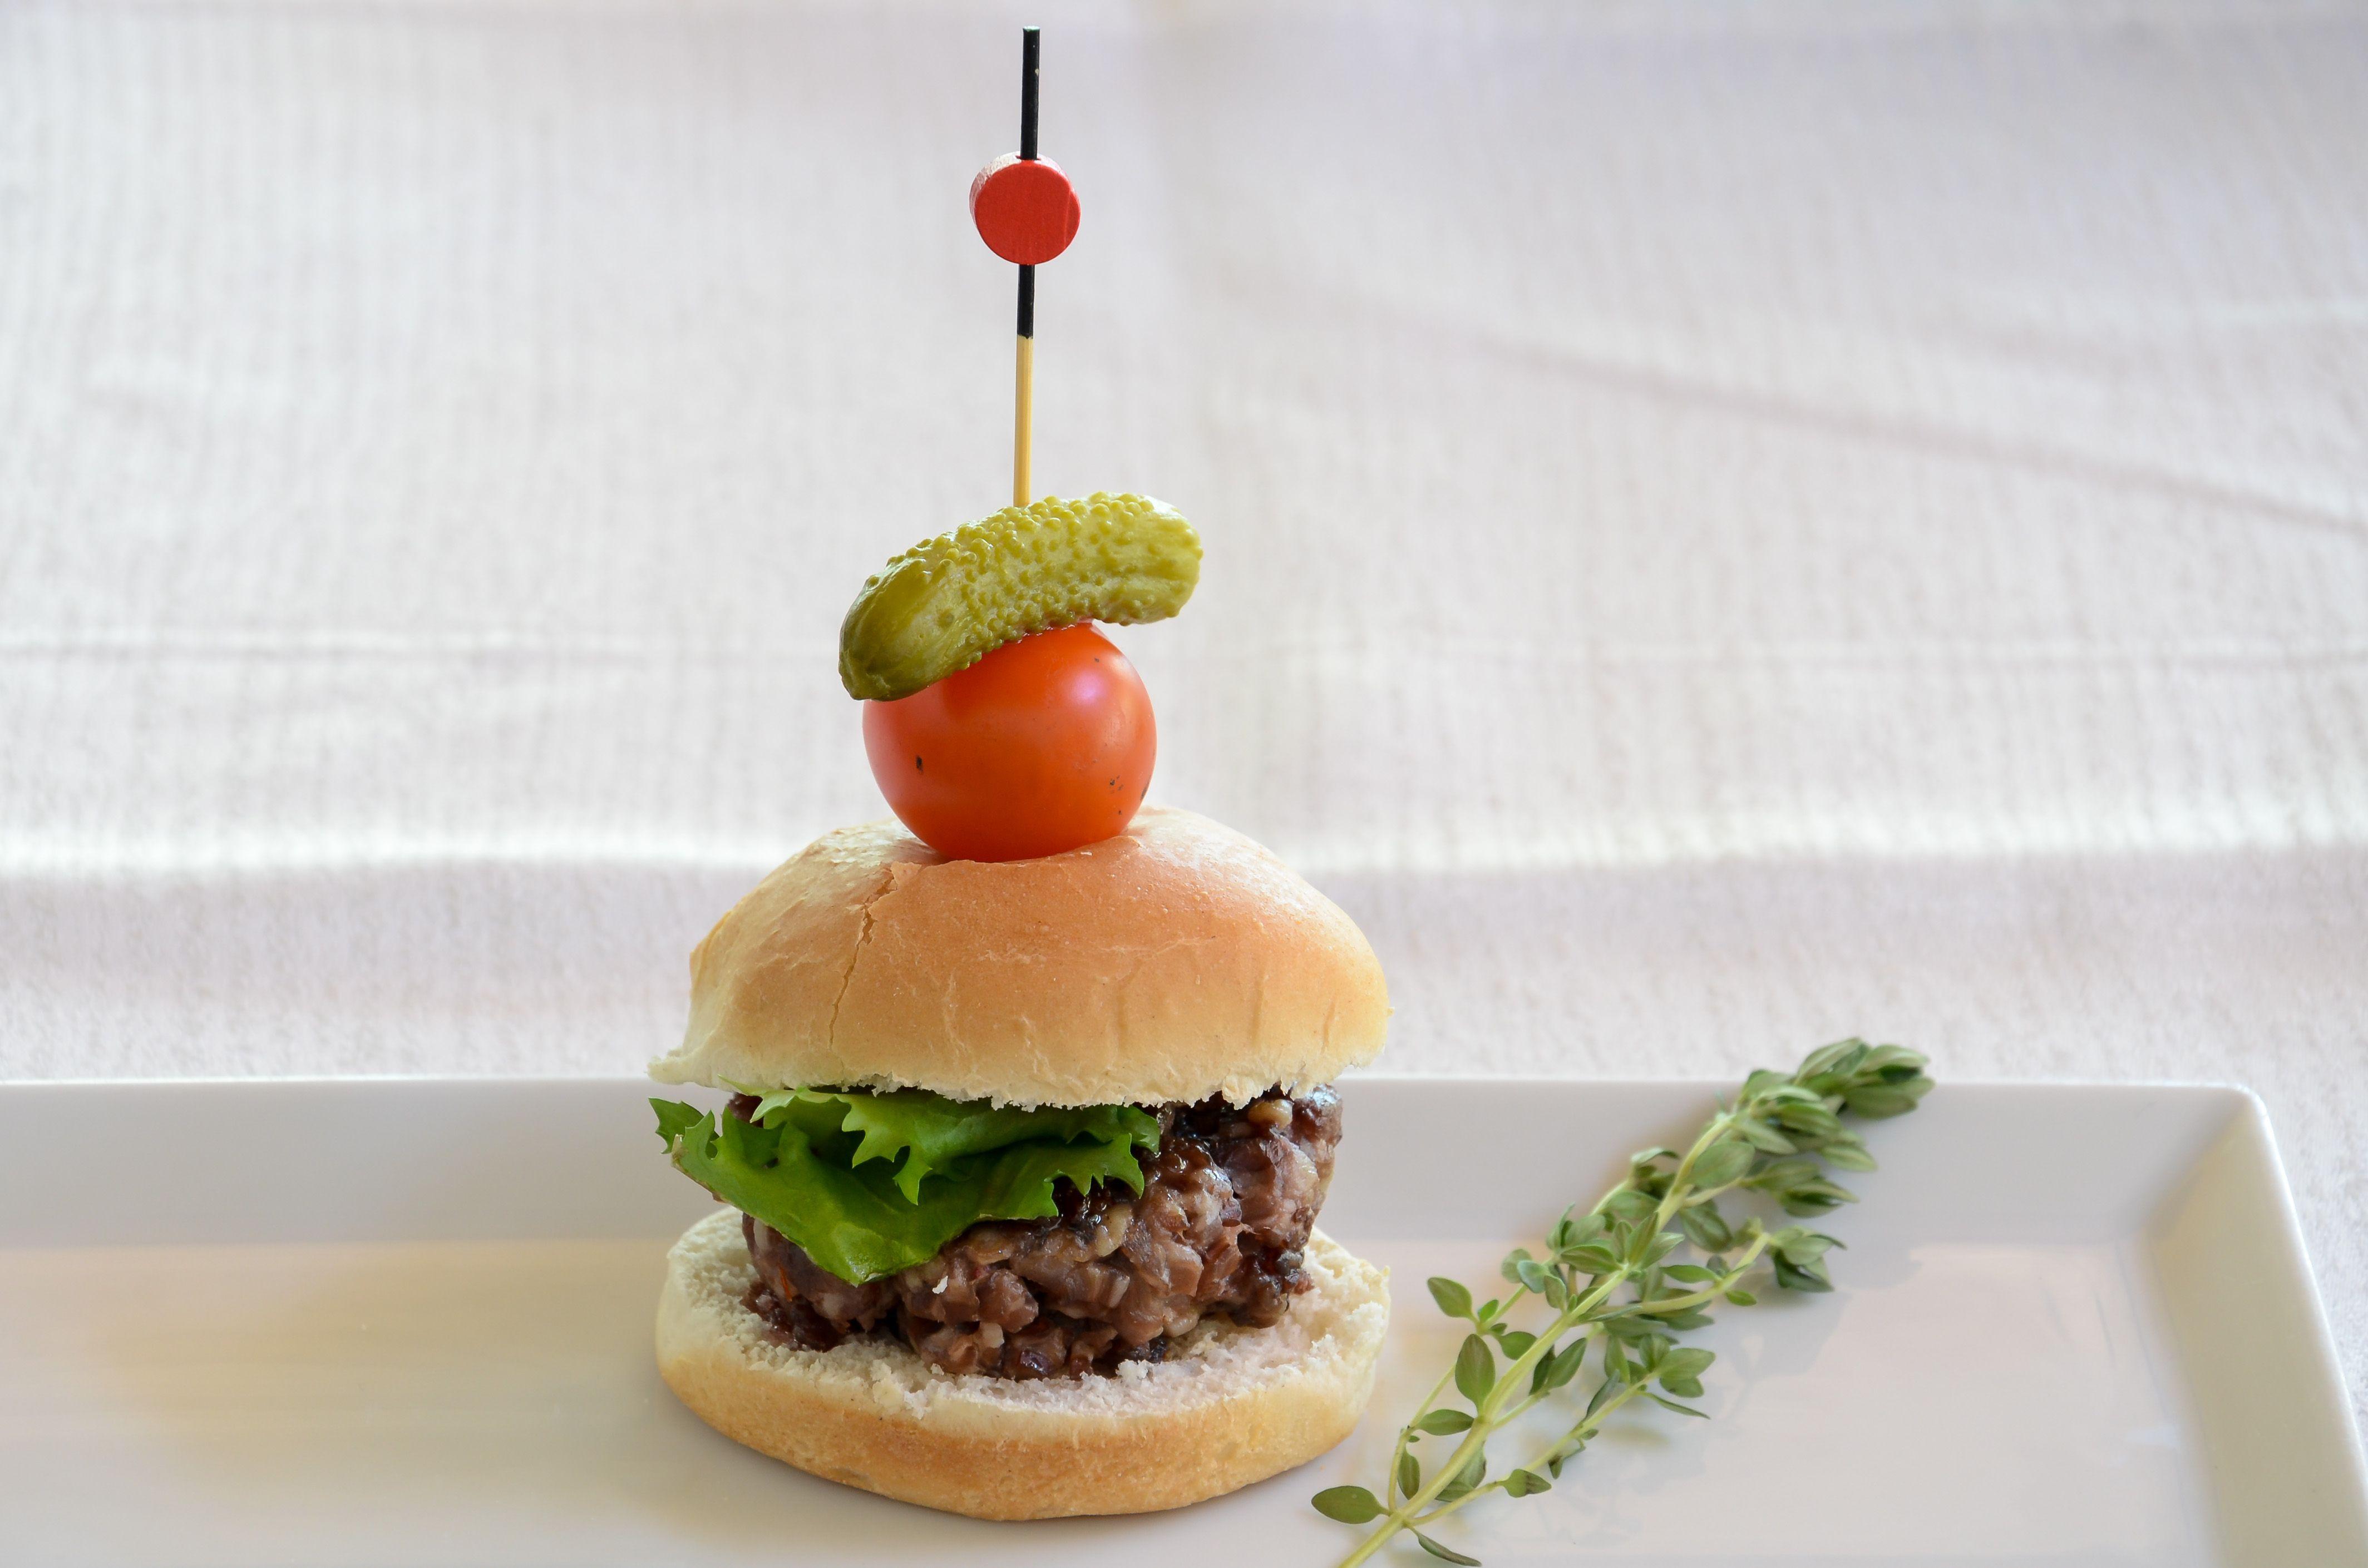 Cocina creativa para cátering en Molina de Segura